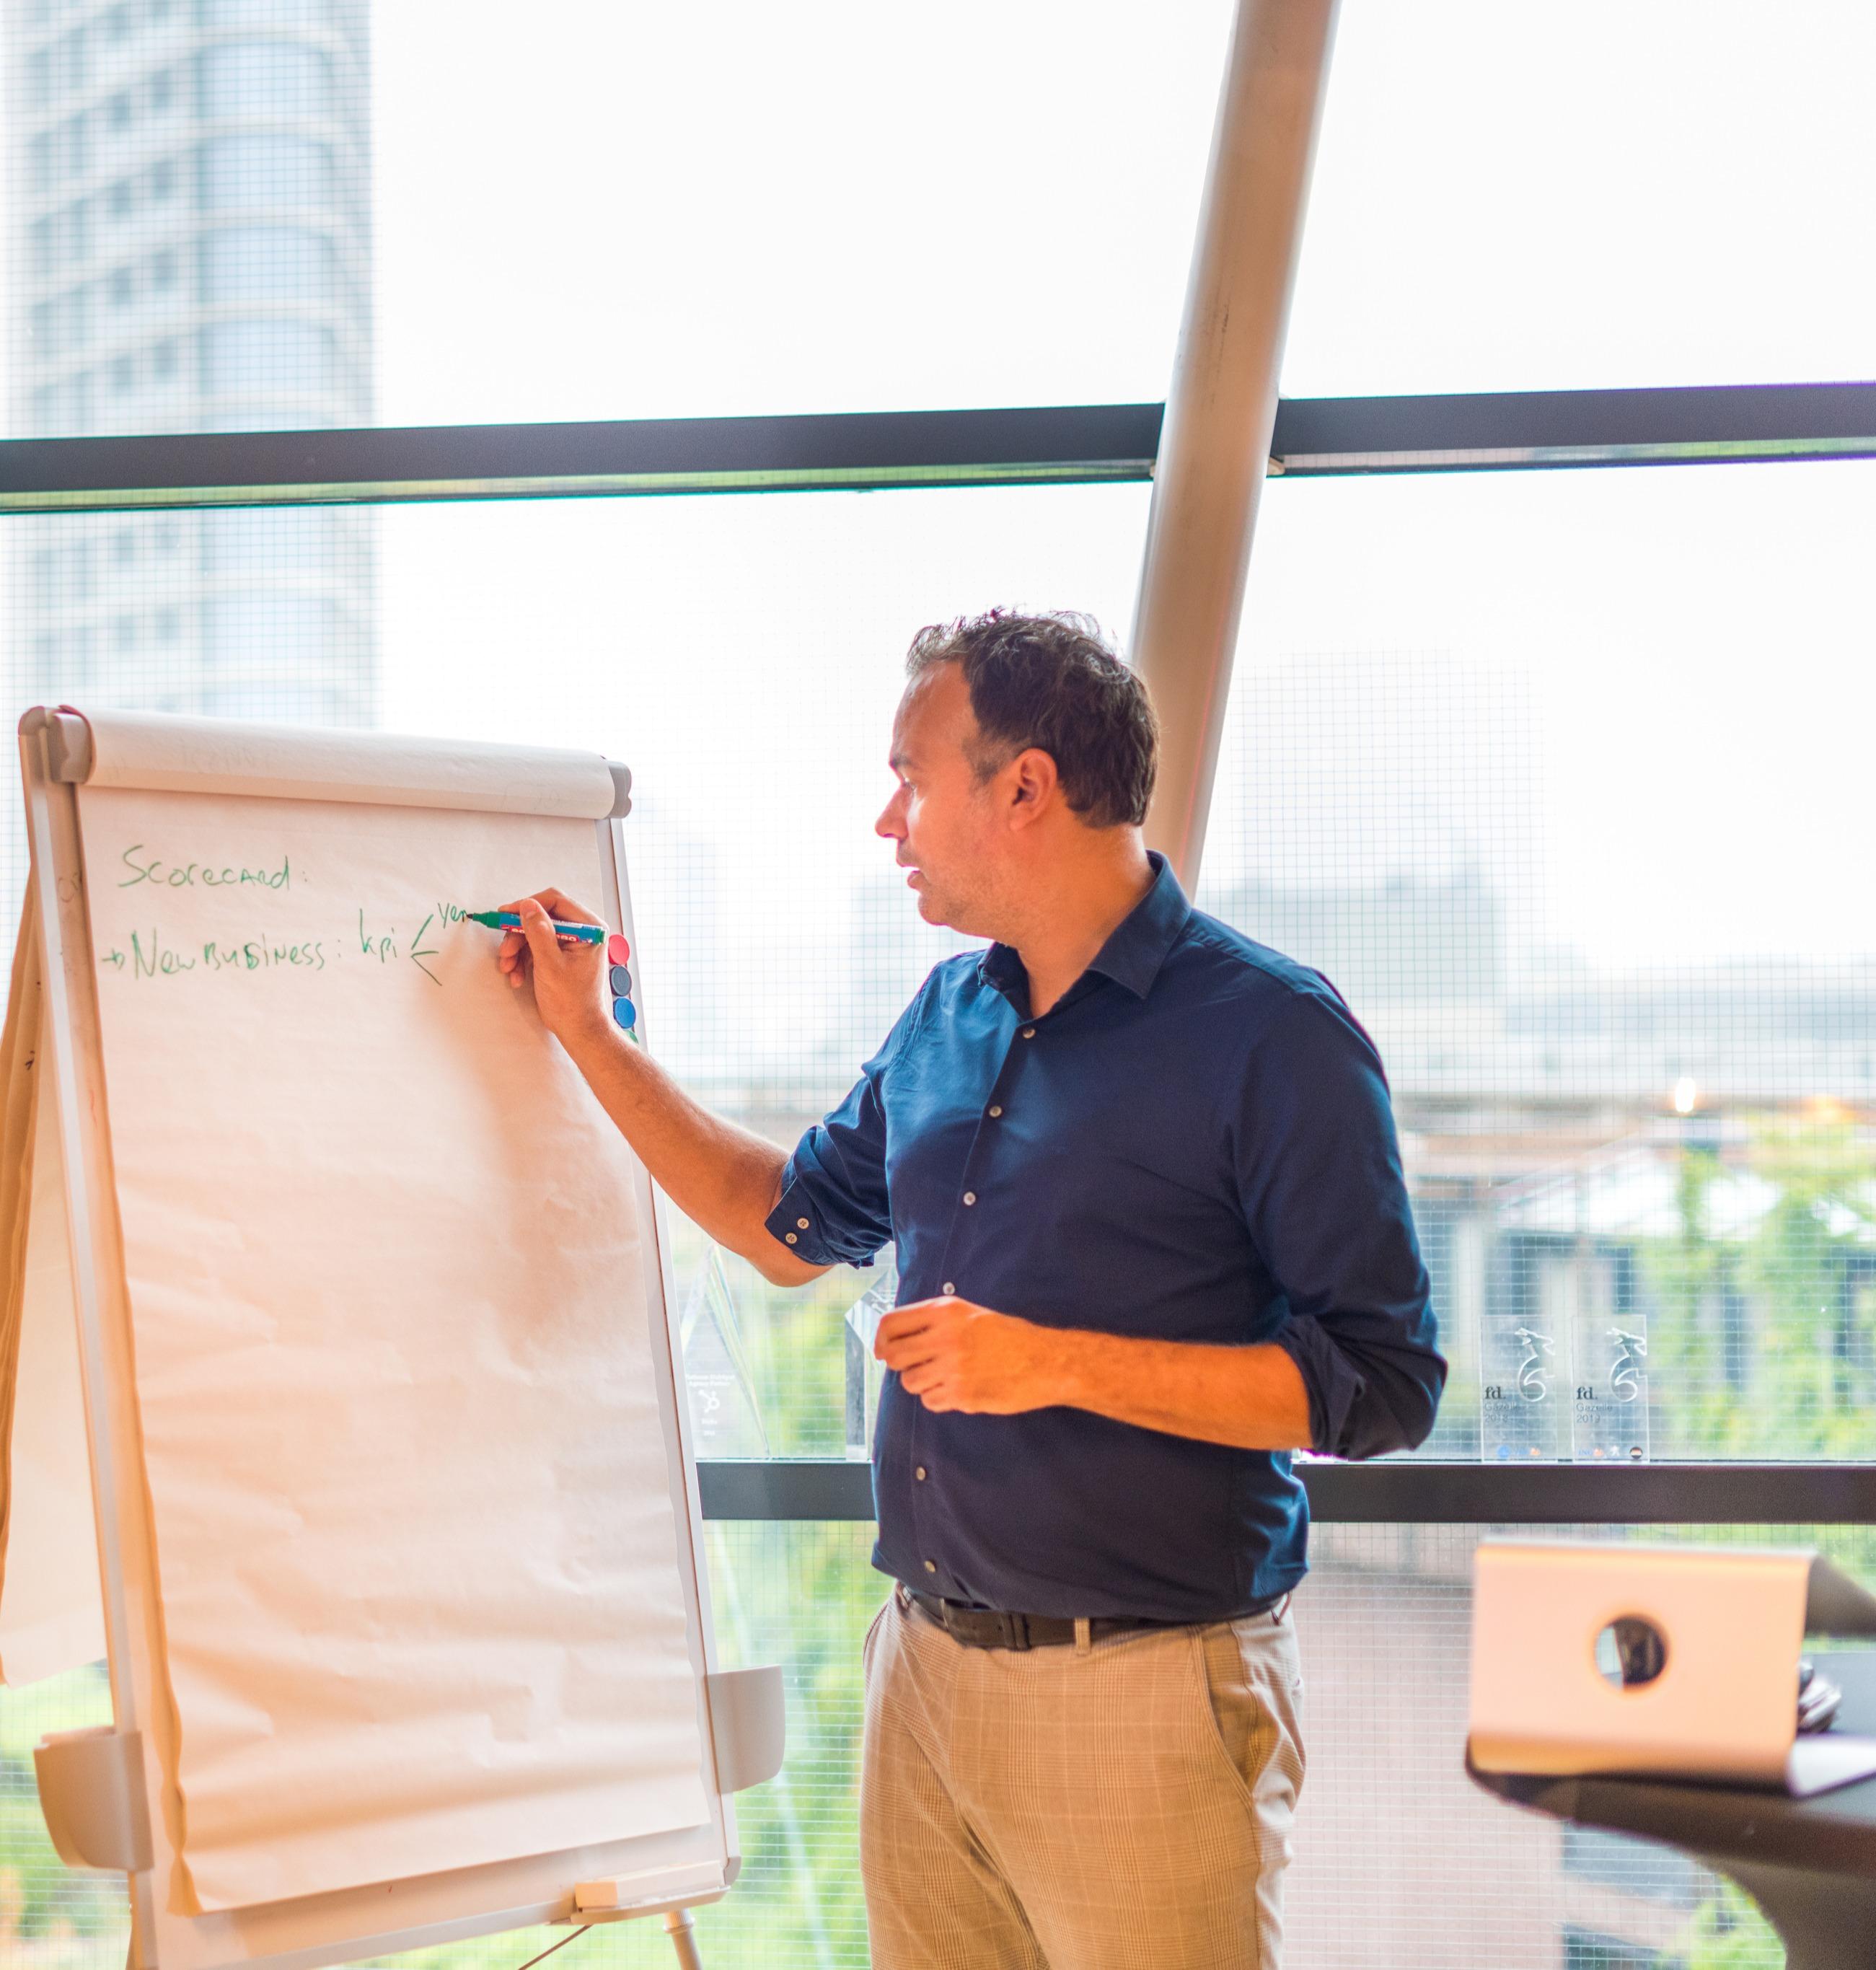 Camiel Freriks explaining a businessmodel using a whiteboard